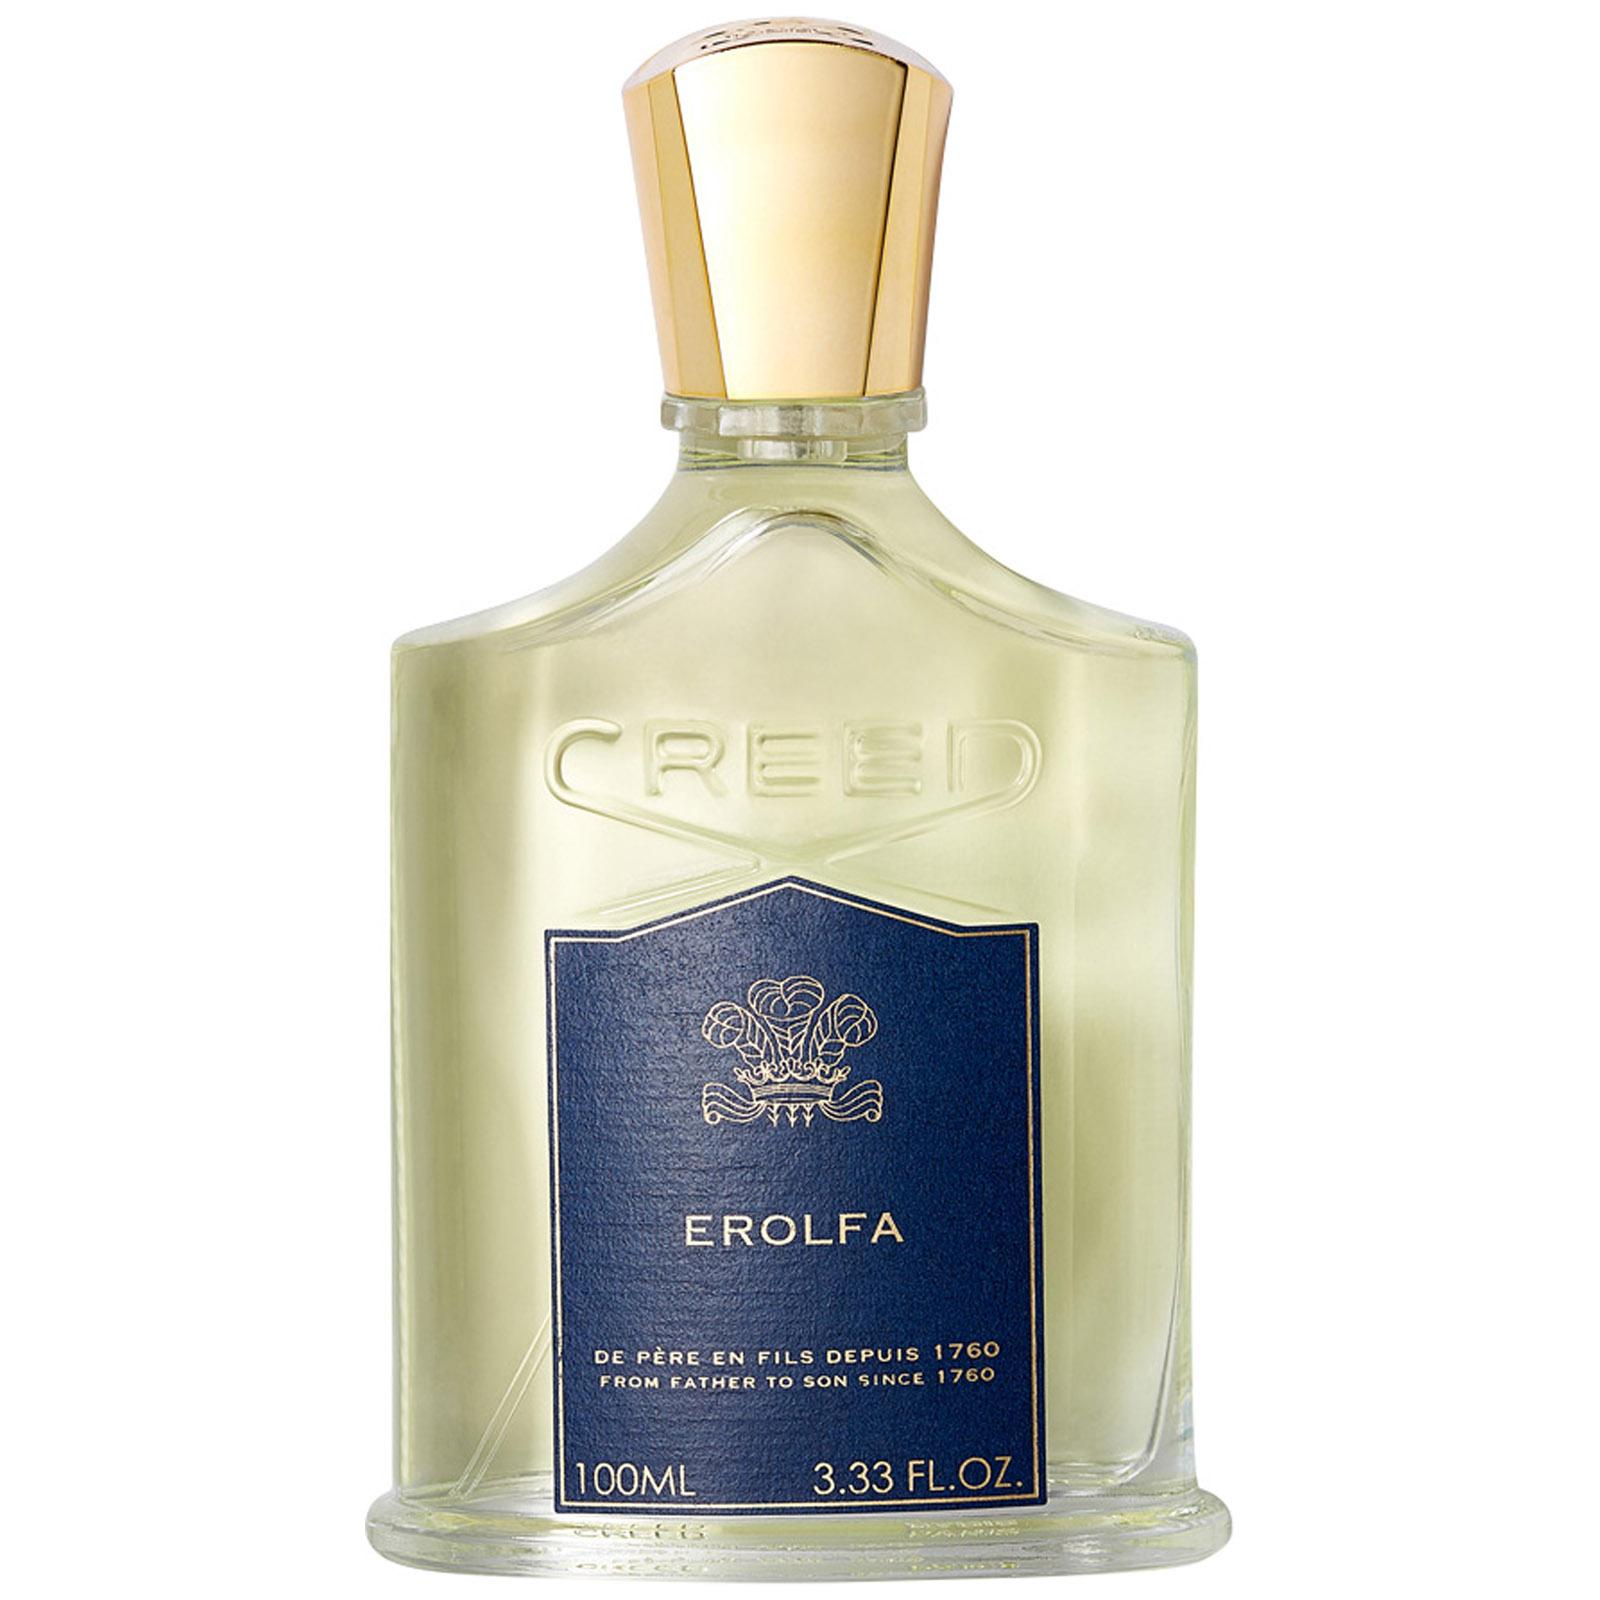 Creed Erolfa Perfume Eau De Parfum 100 ml In White